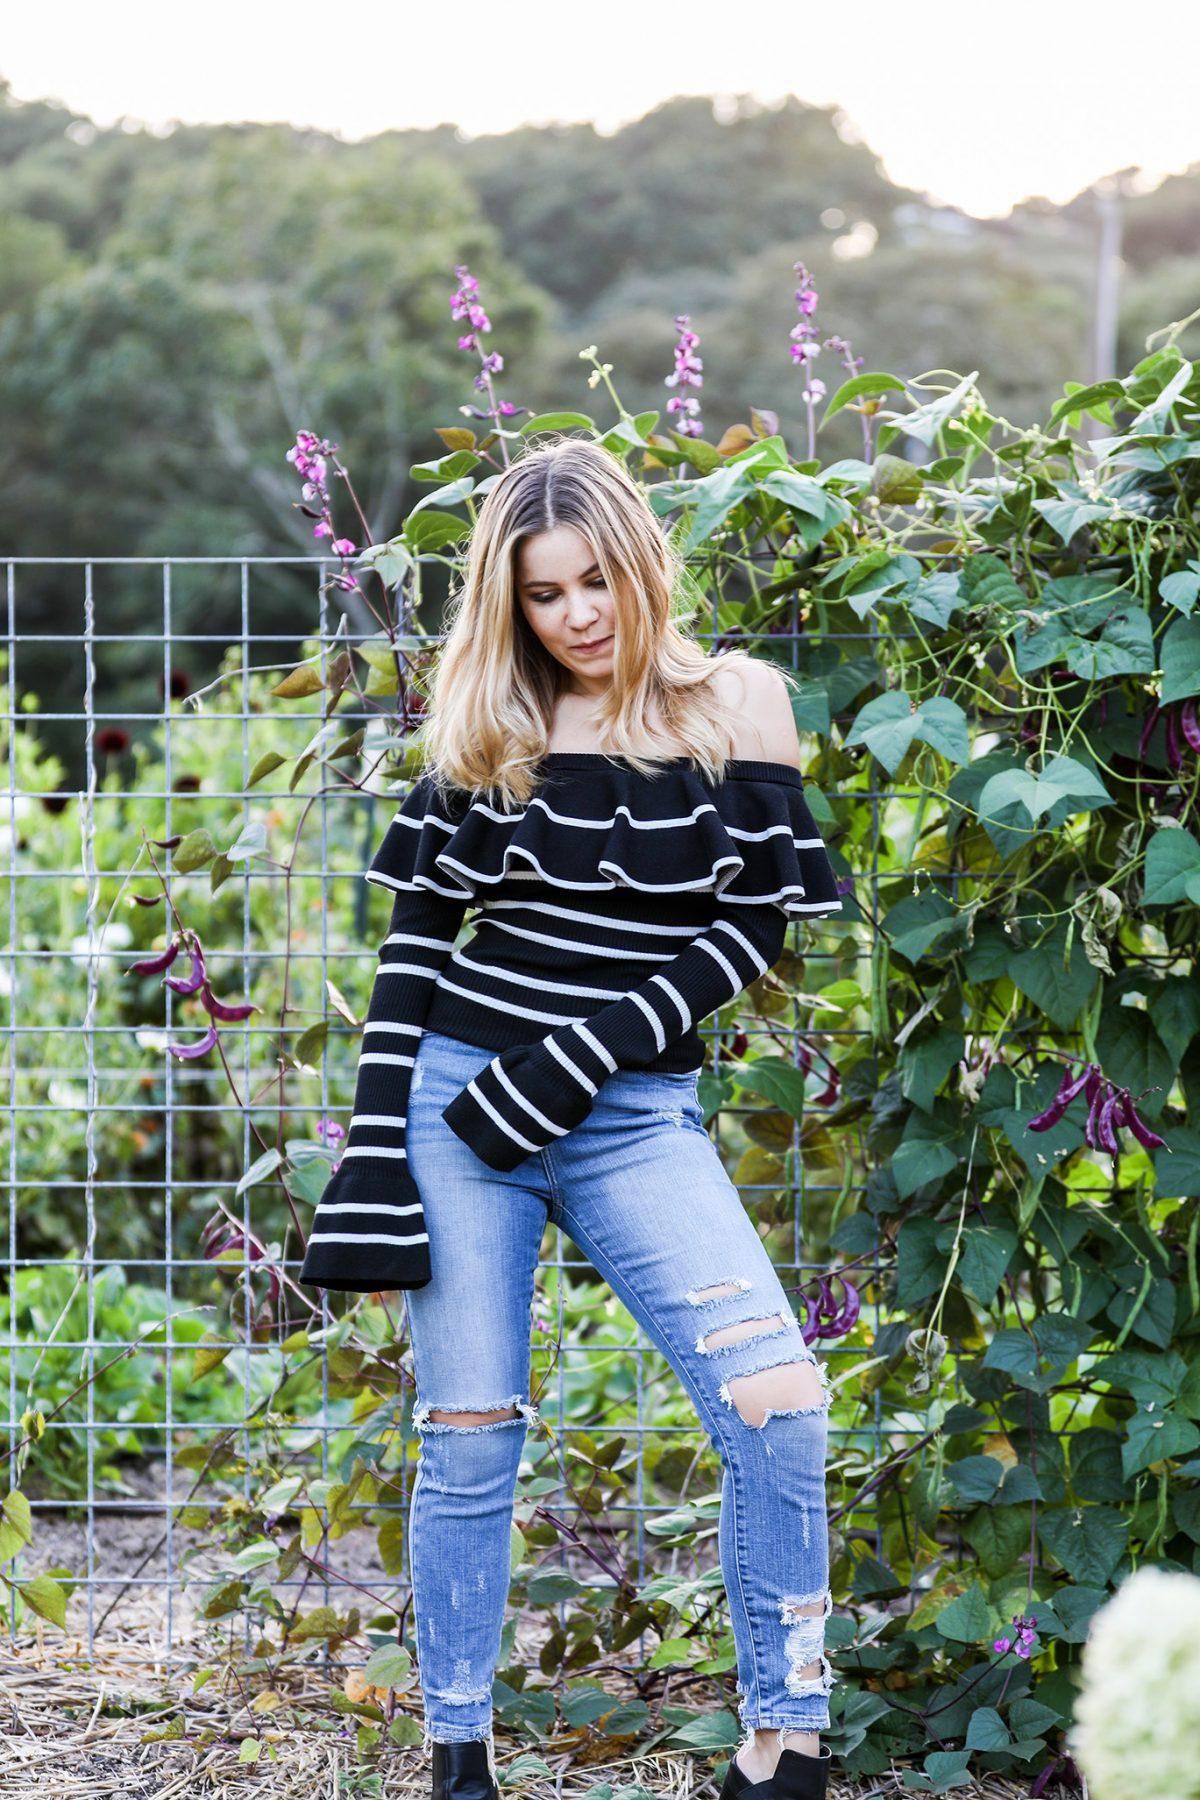 Blogging Confessions: Let's Talk Branding